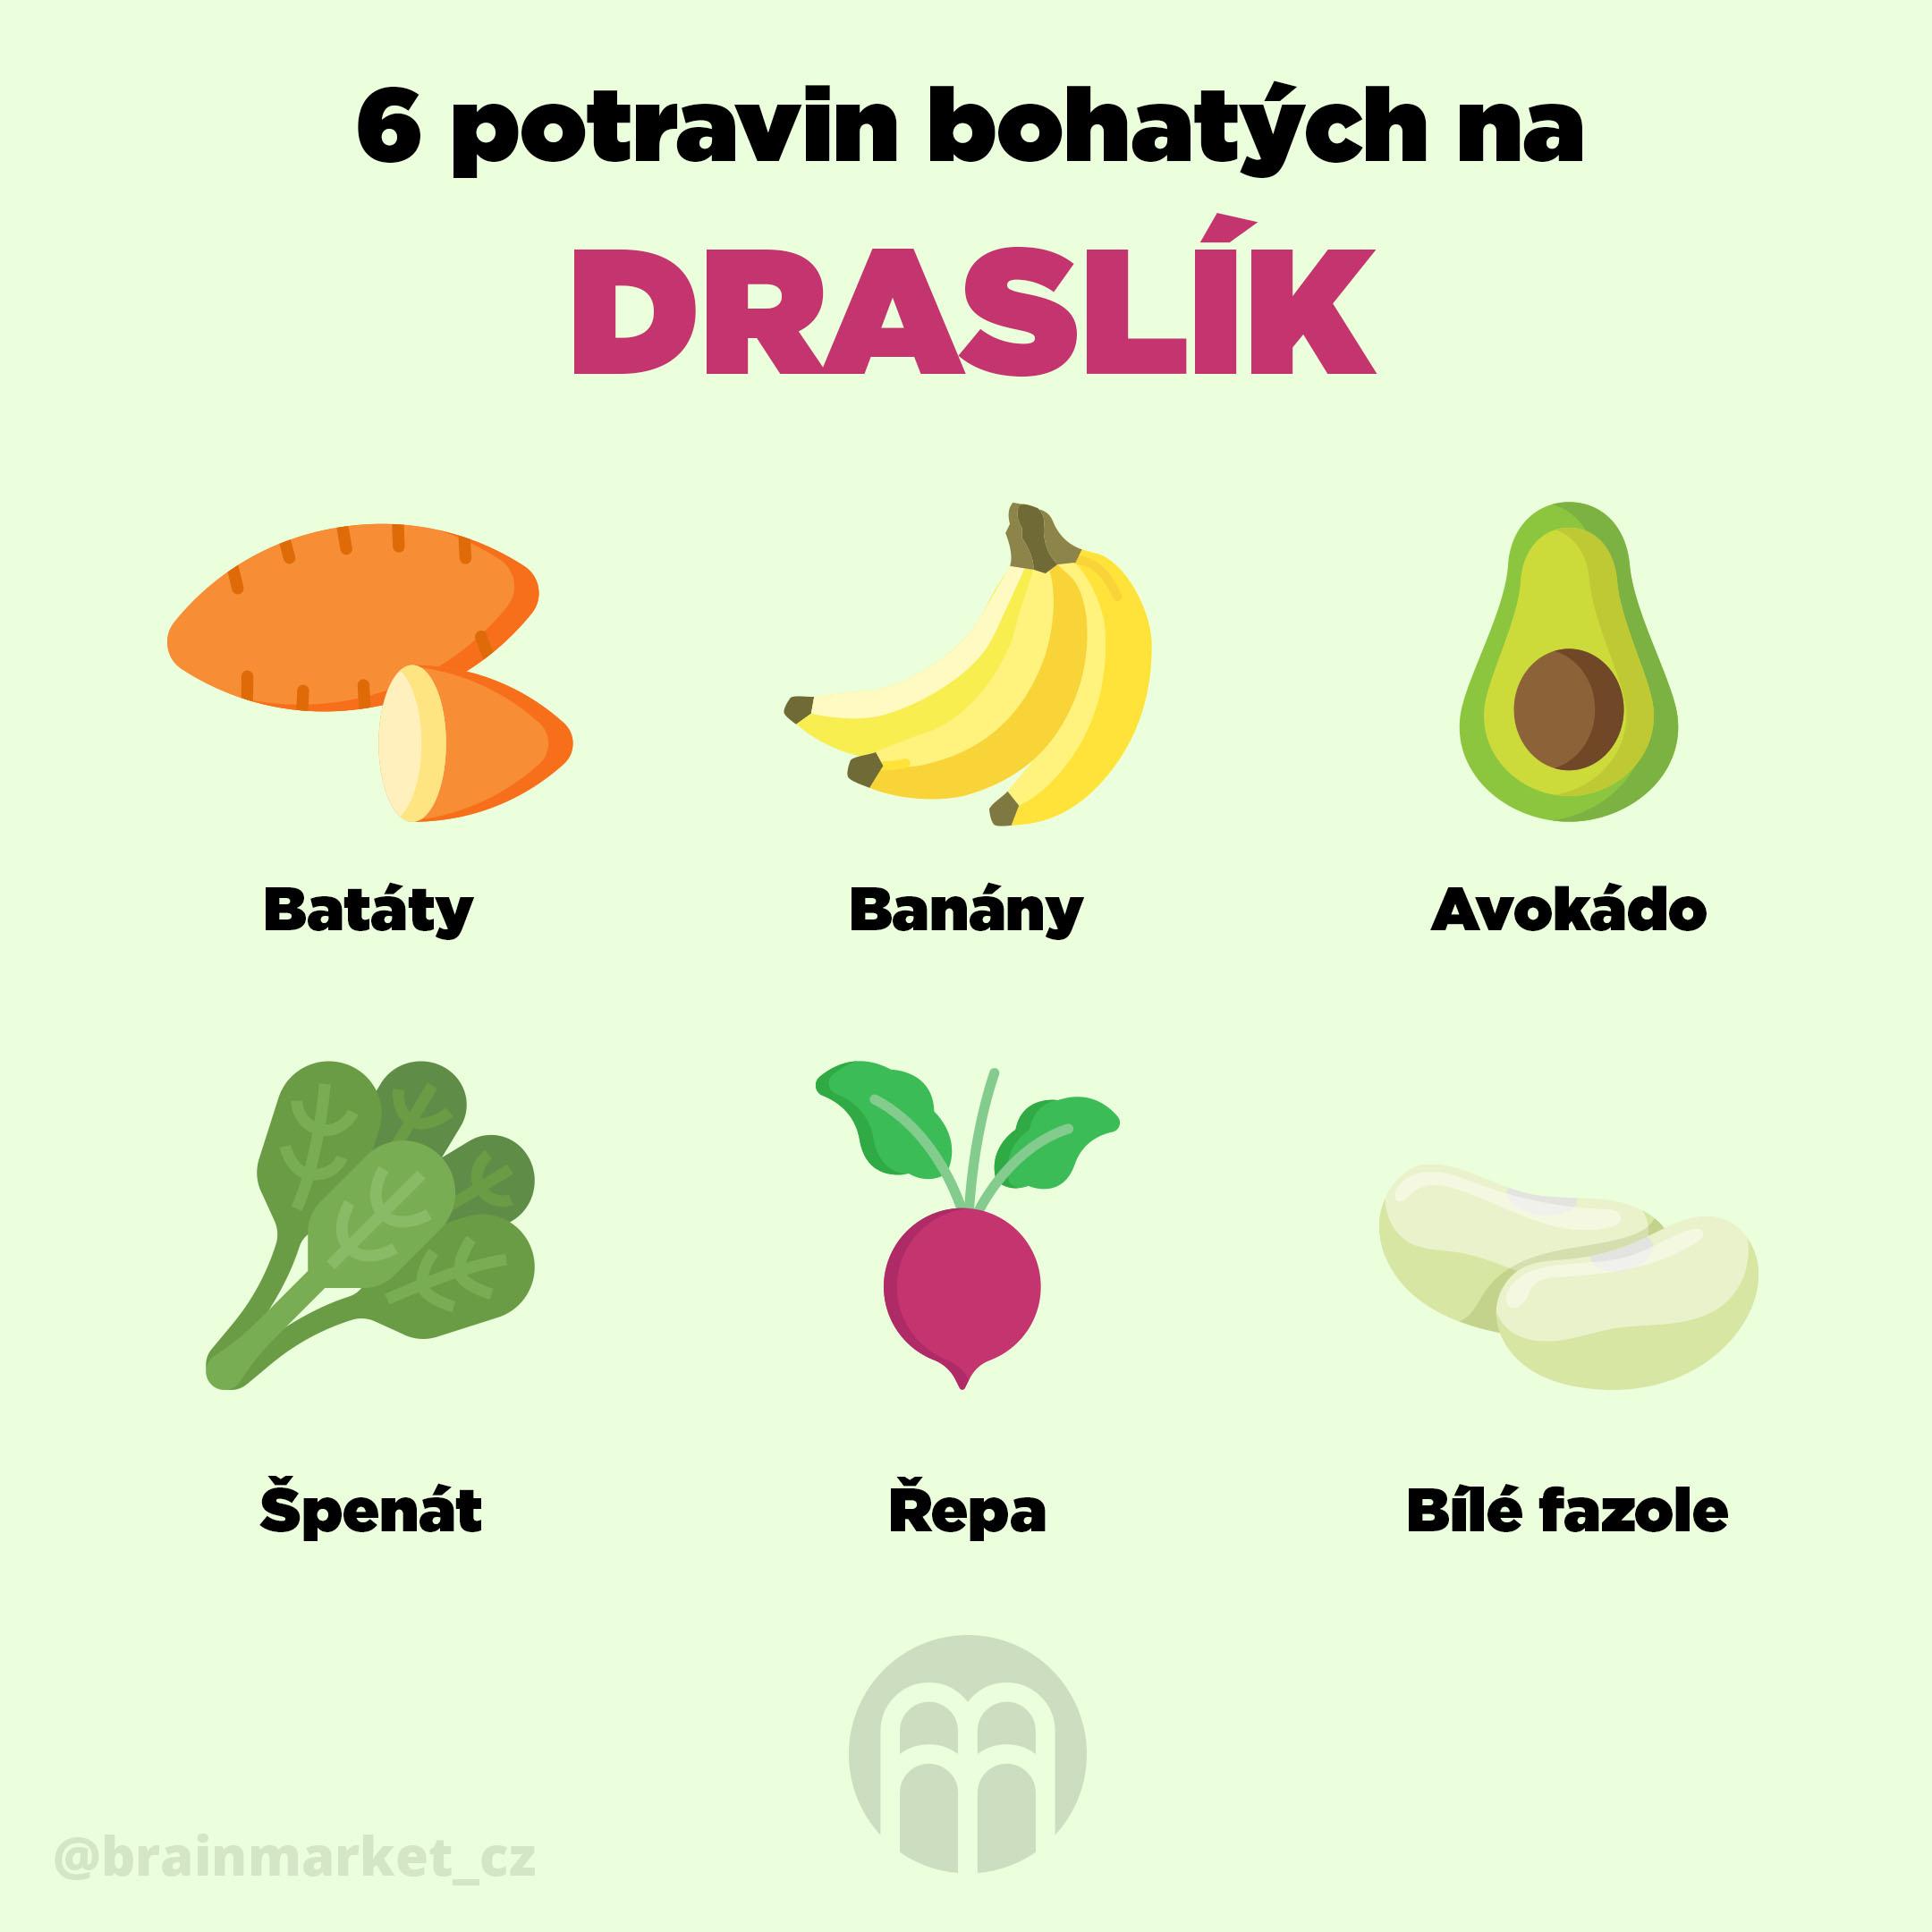 6_potravin_bohatych_na_draslik